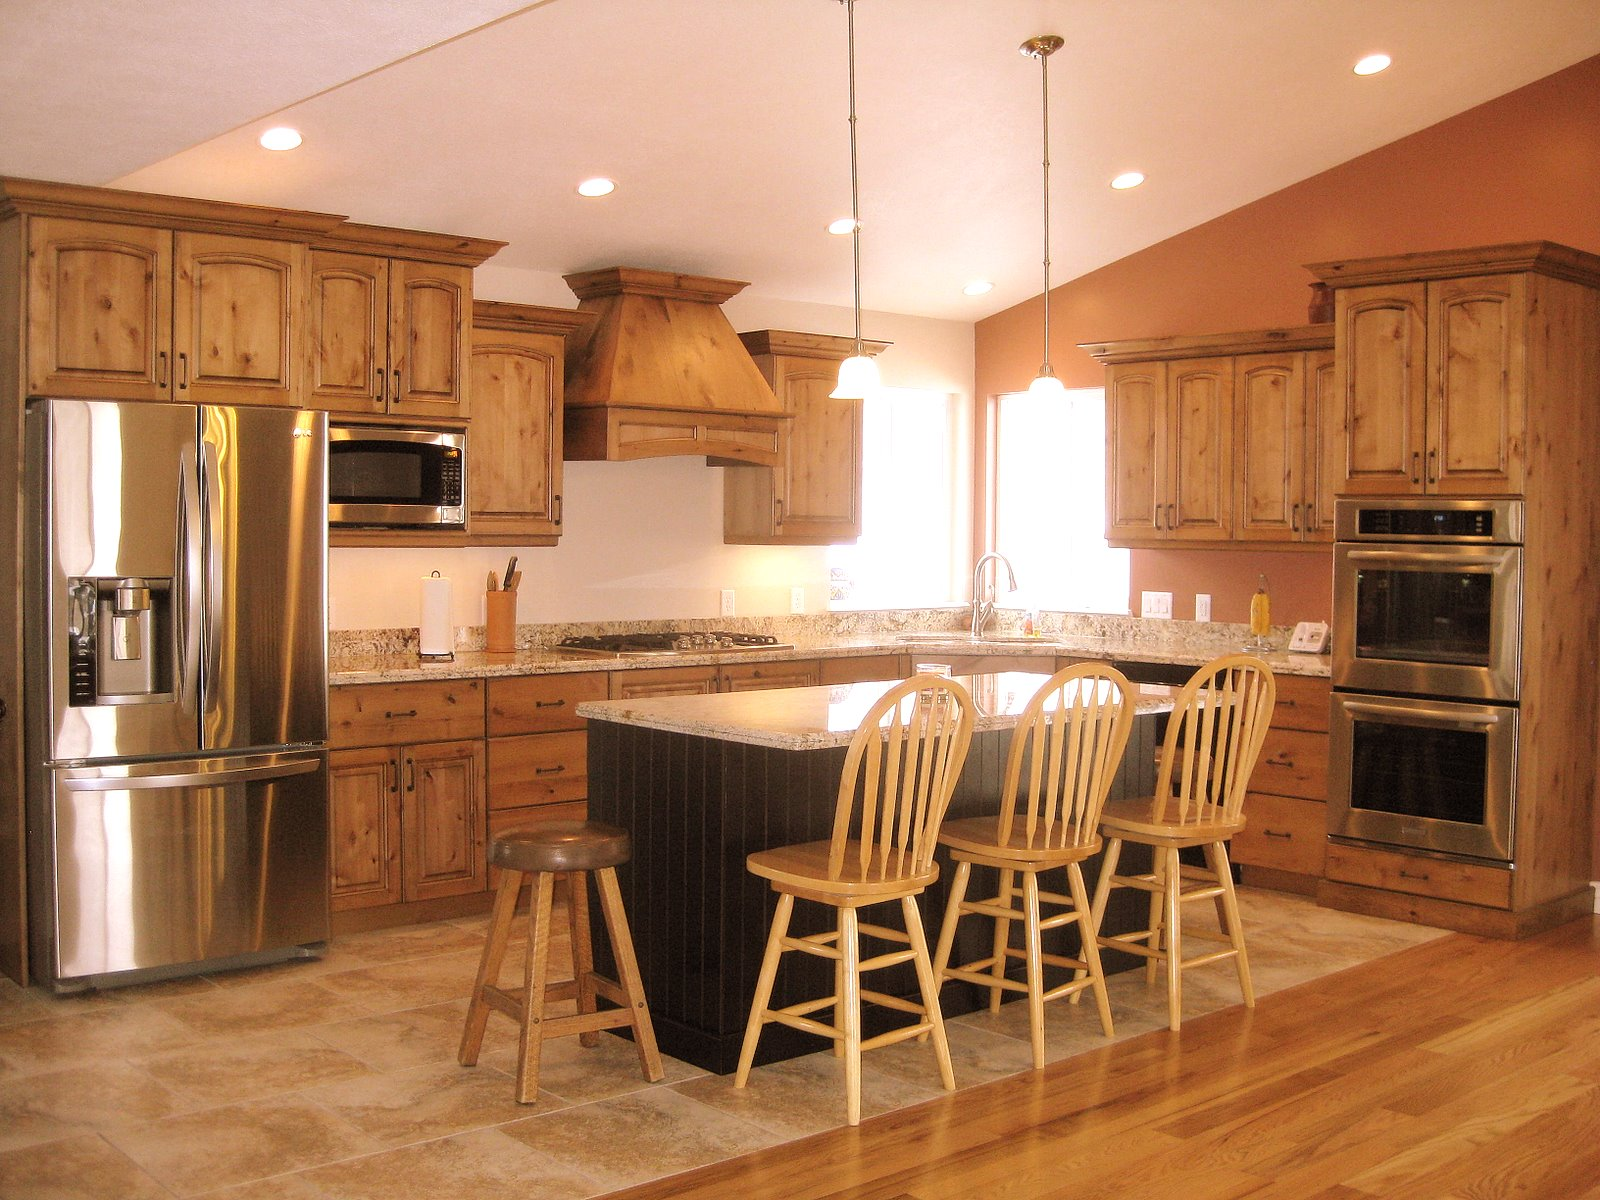 Alder Cabinets Kitchen Sink Drain Installation Lec With Bead Board Island